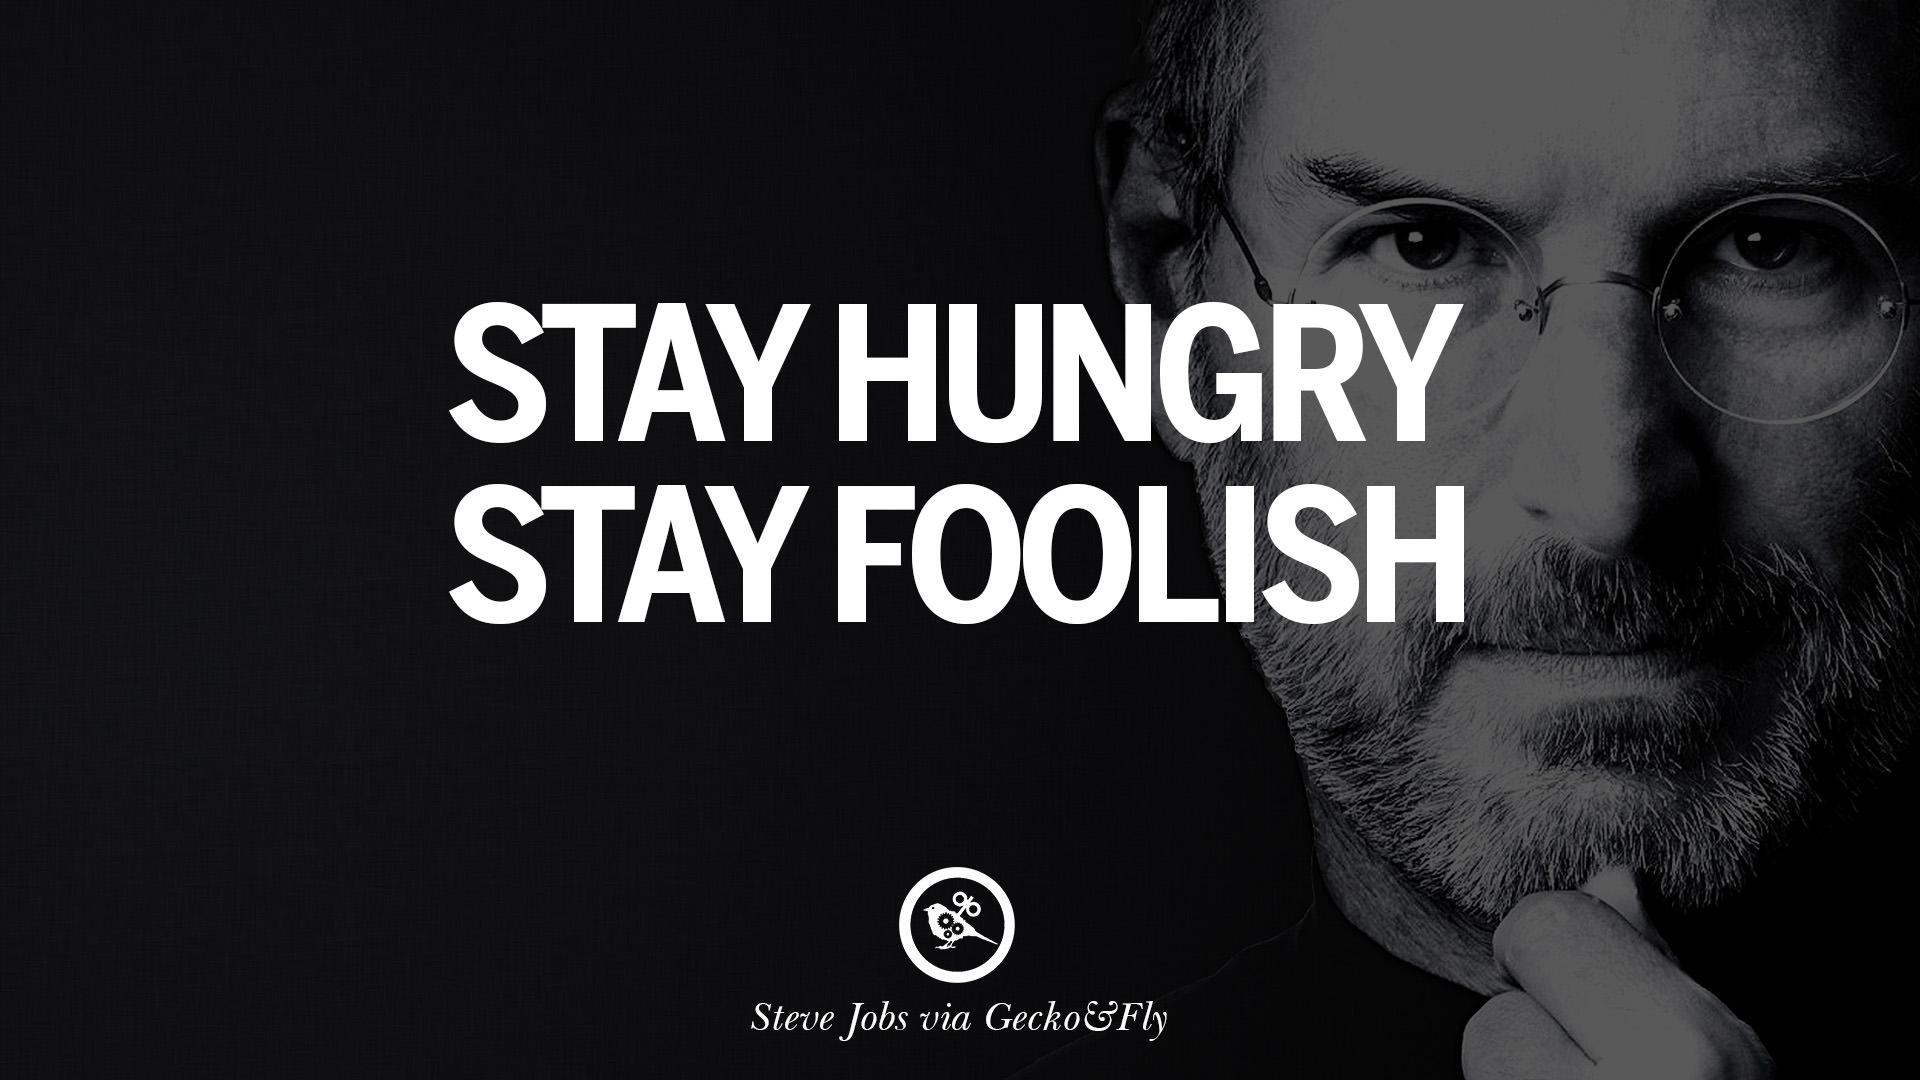 Warren Buffett Quotes Iphone Wallpaper 13 Memorable Quotes By Steven Paul Steve Jobs For